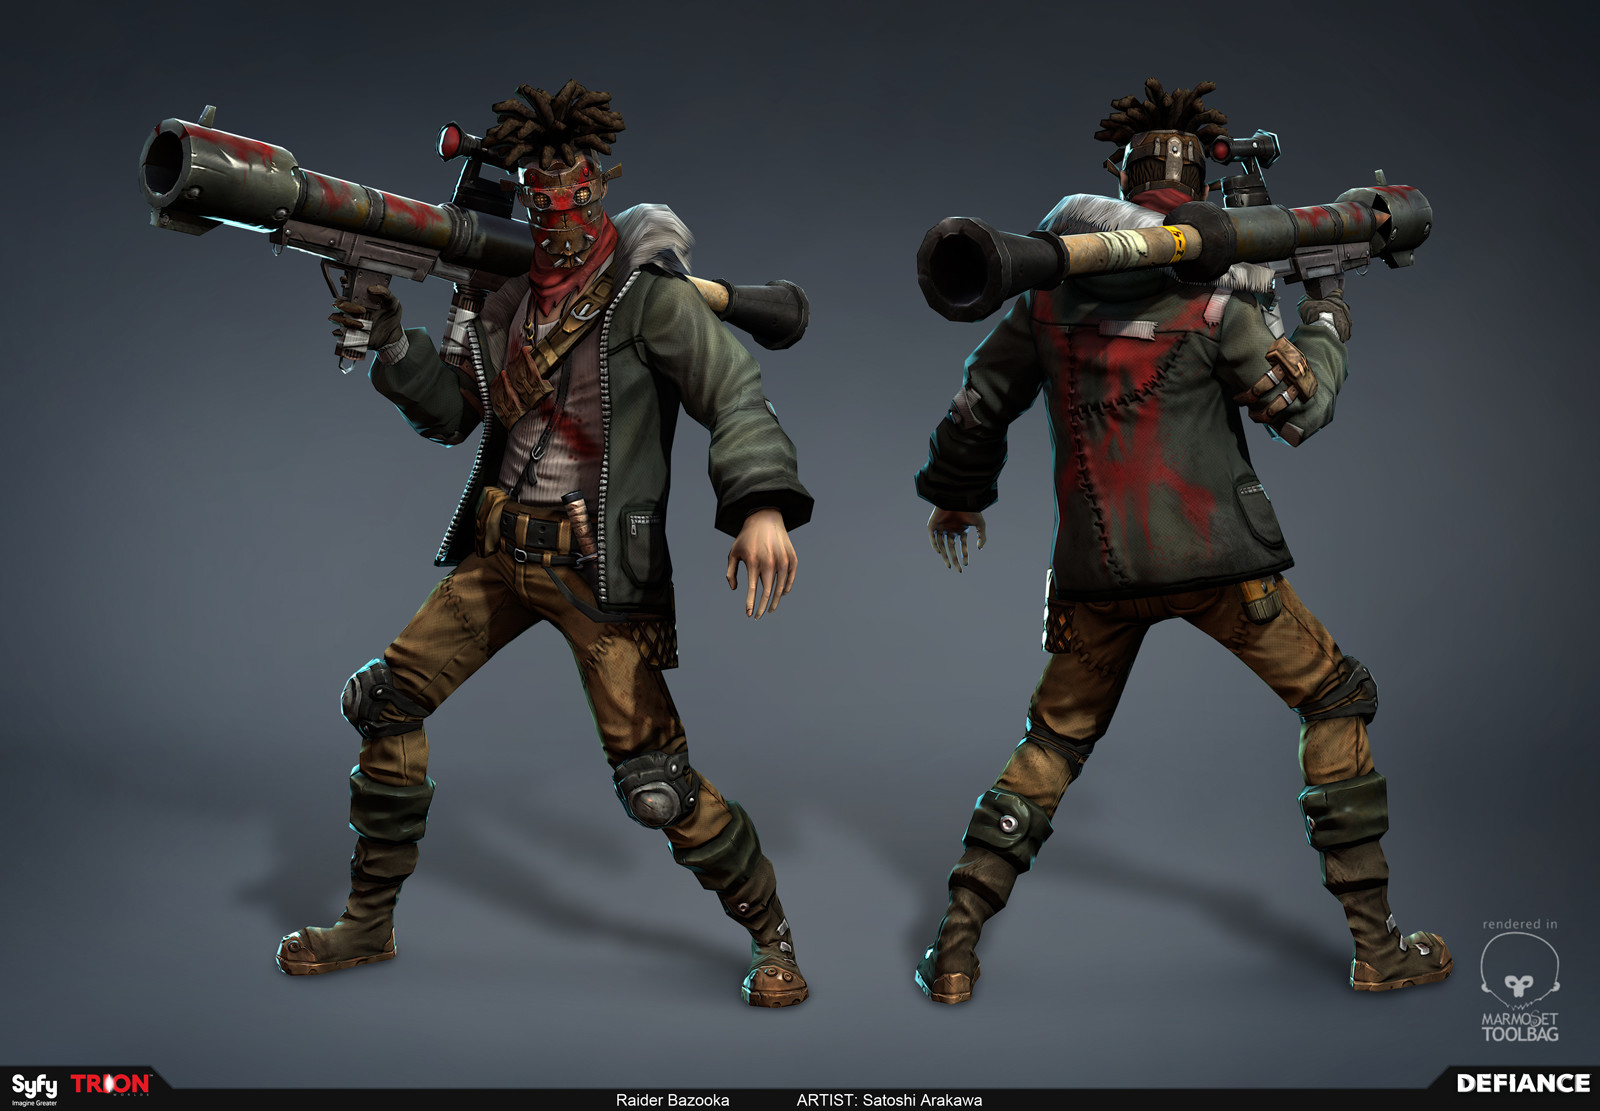 Defiance - Blitzer Raider Bazooka